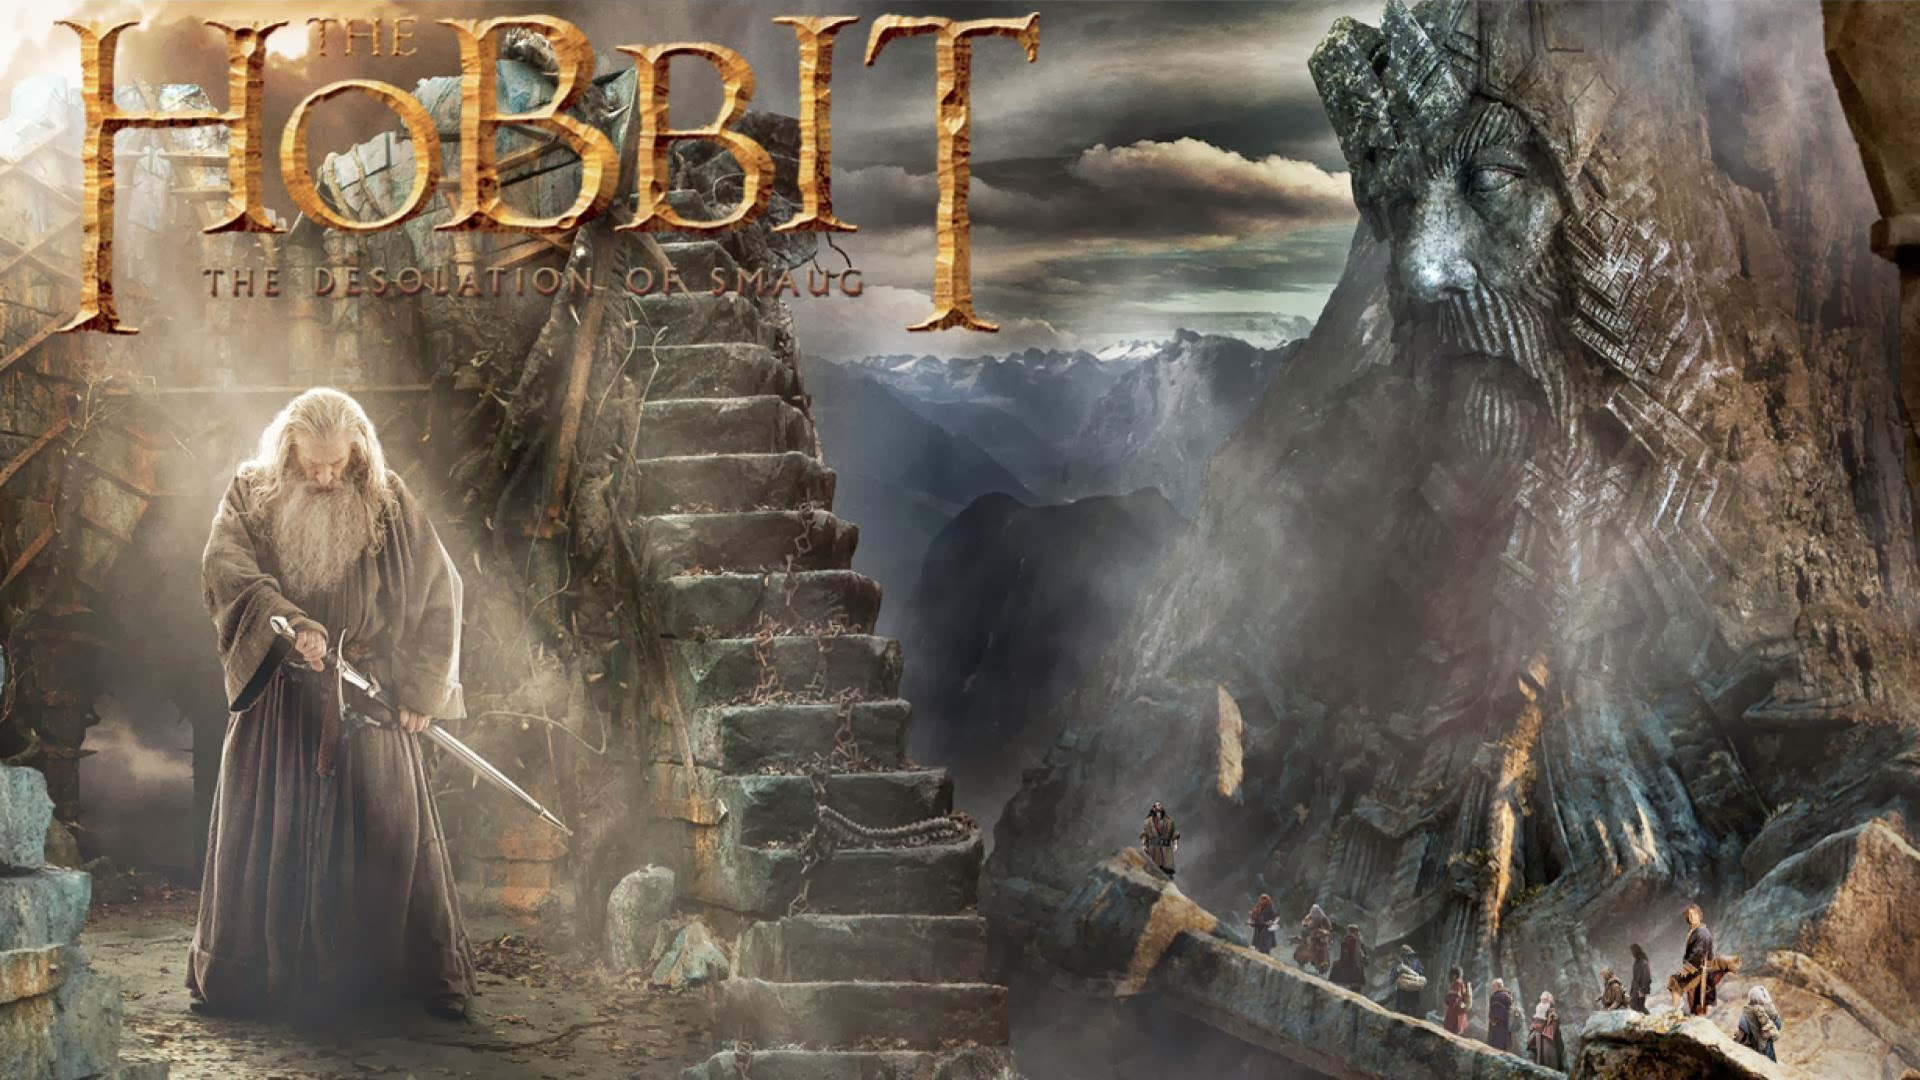 Wallpaper The Hobbit The Desolation Of Smaug Gandalf HD Wallpaper 1920x1080